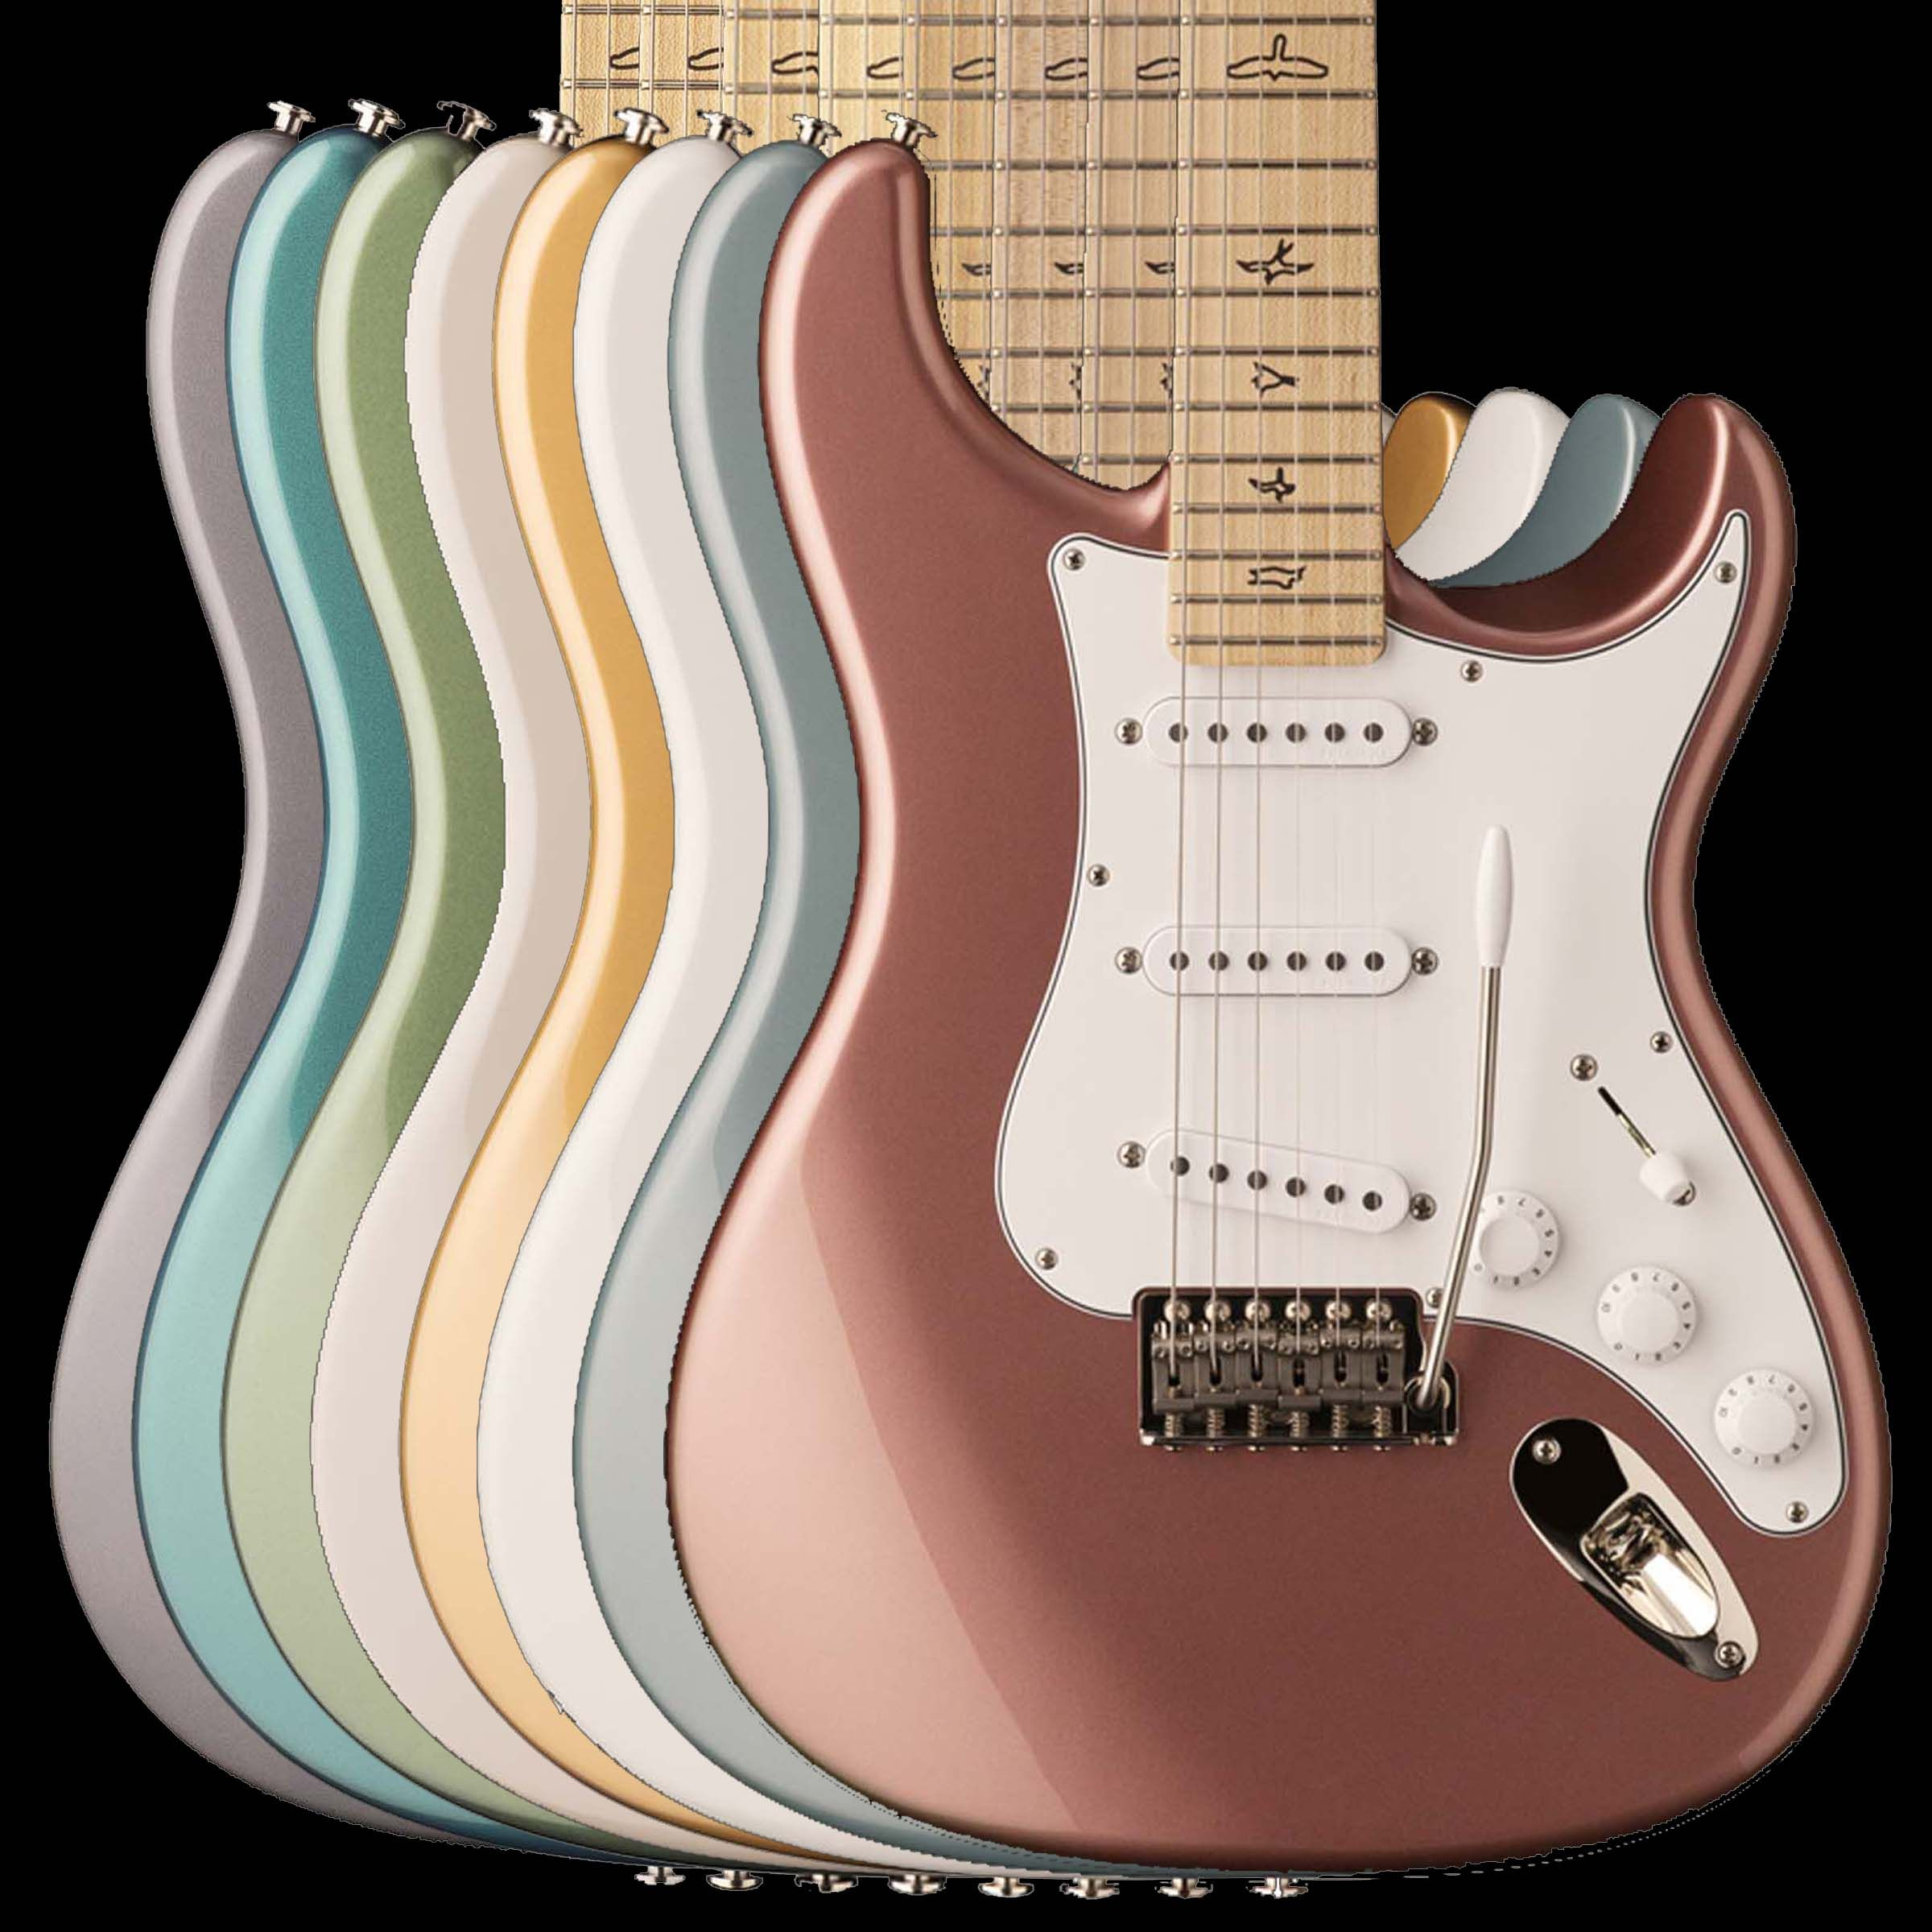 Prs Guitars Announces Next Evolution Of The John Mayer Silver Sky John Mann S Guitar Vault In 2020 Prs Guitar Guitar Learn Guitar